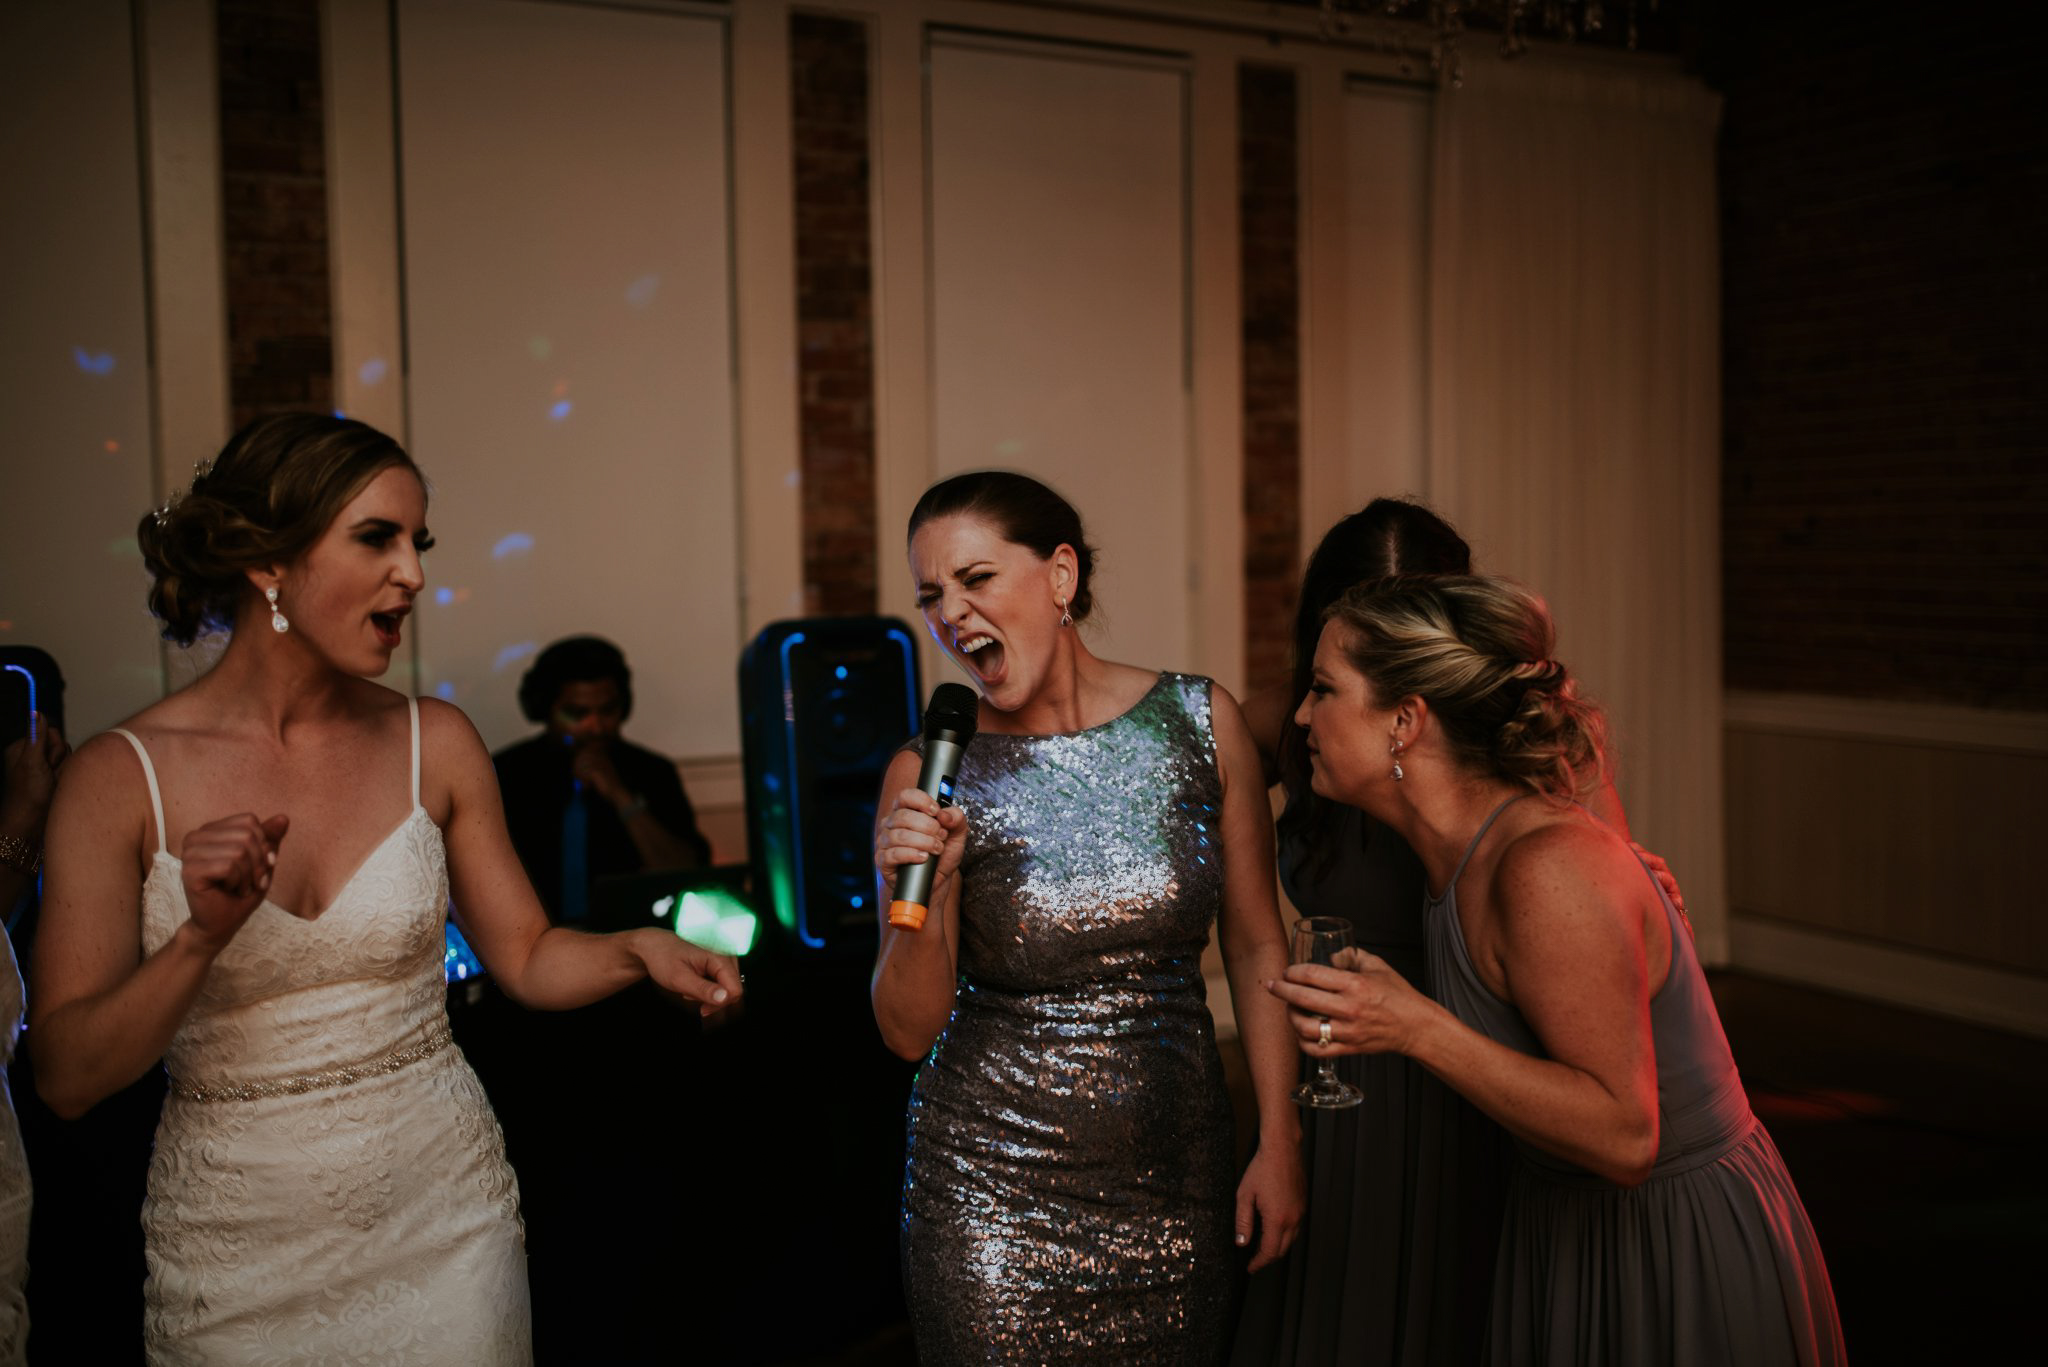 hollywood-school-house-wedding-seattle-photographer-caitlyn-nikula-126.jpg